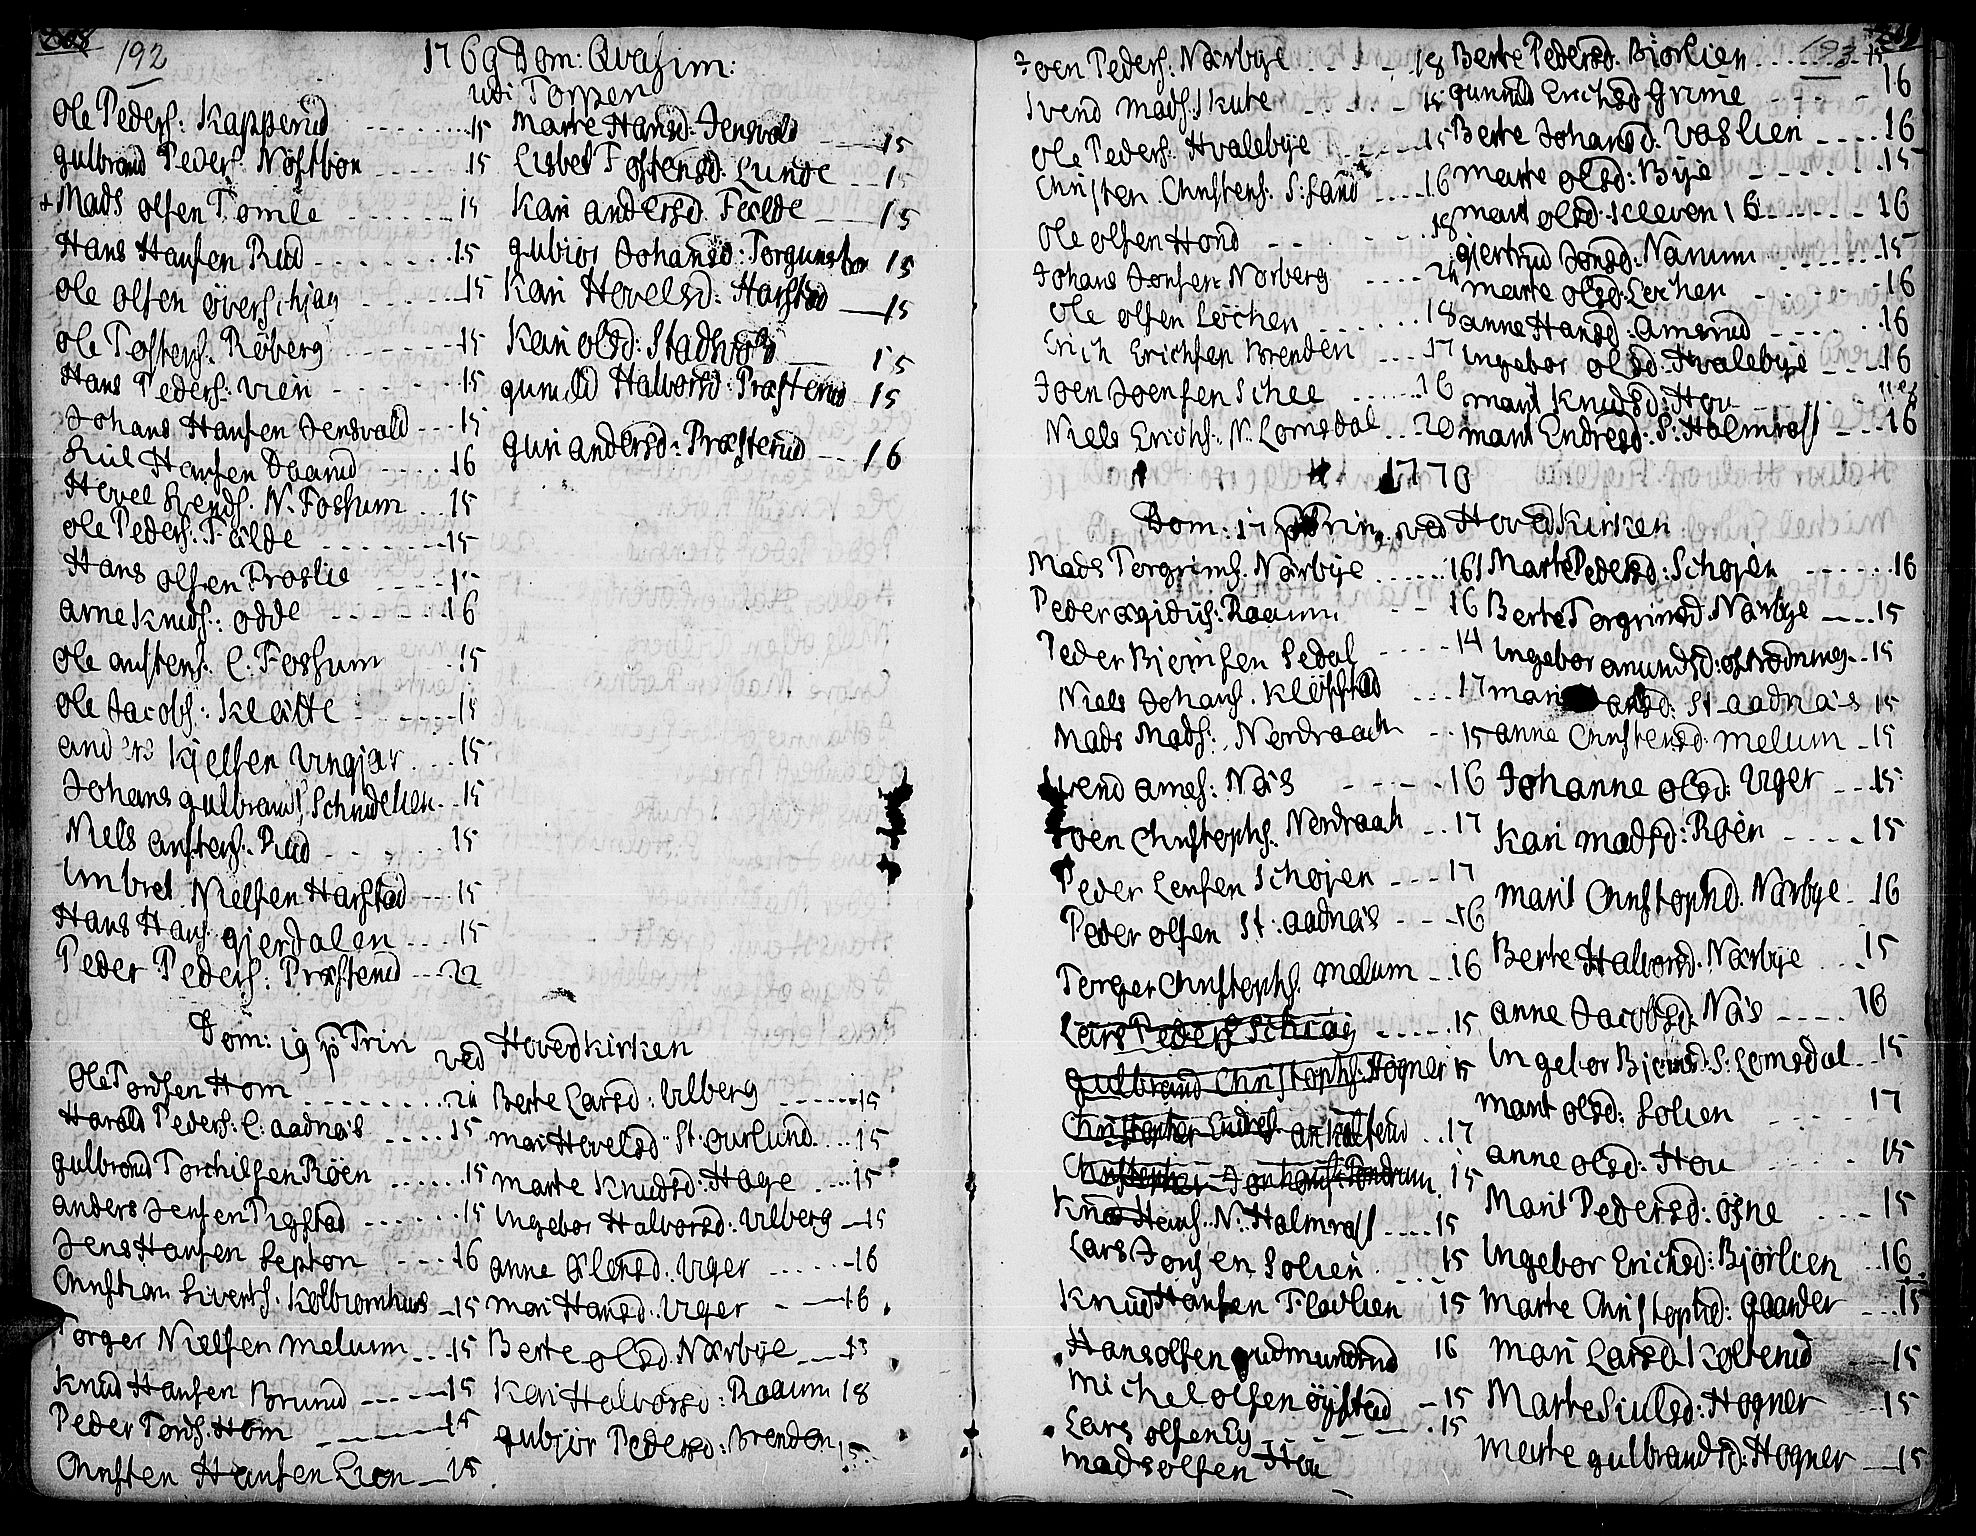 SAH, Land prestekontor, Ministerialbok nr. 5, 1765-1784, s. 192-193